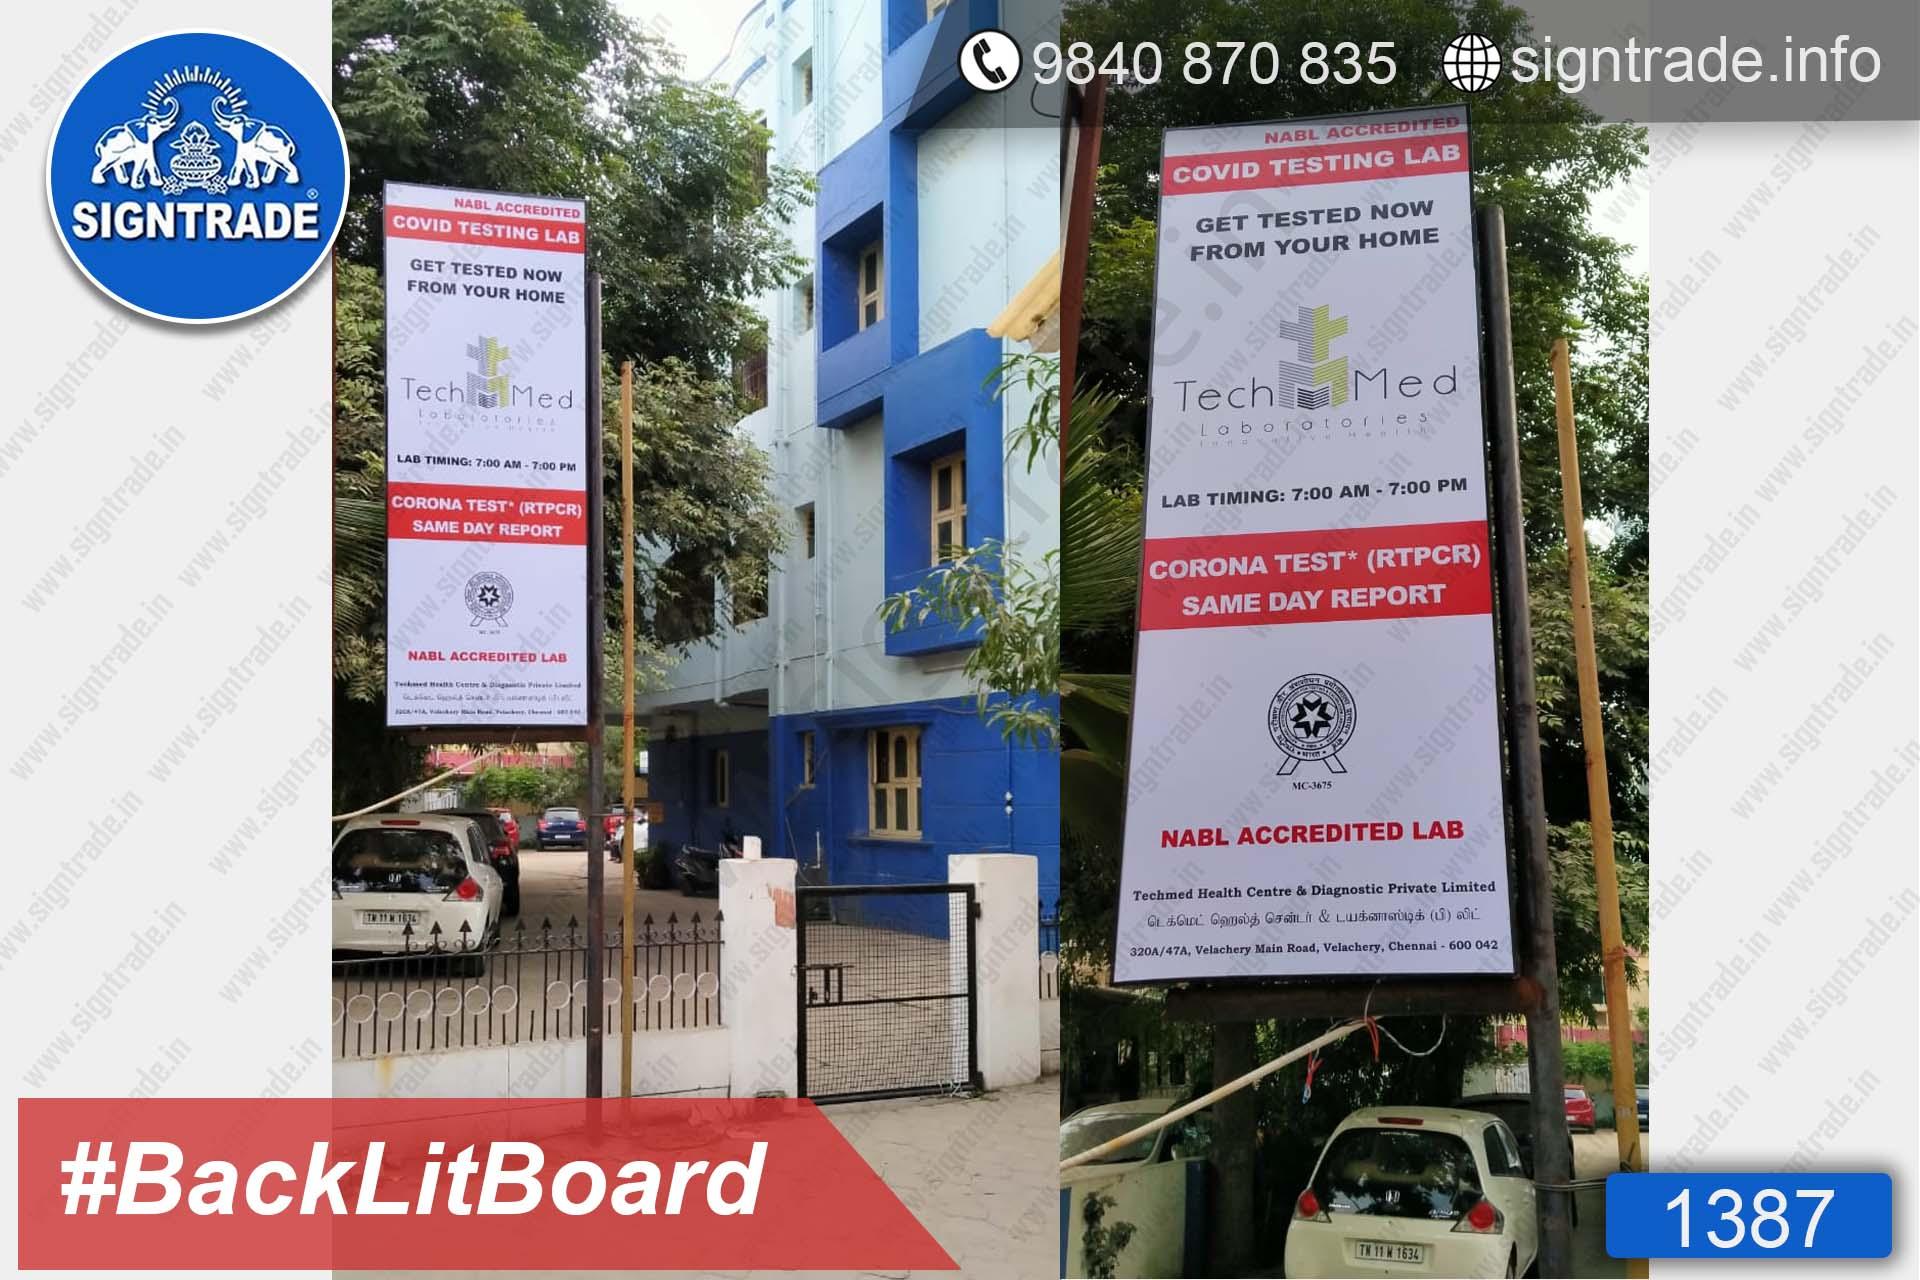 Tech Med - COVID Testing Lab - 1387, Flex Board, Backlit Flex Board, Star Backlit Flex Board, Backlit Flex Banners, Shop Front Flex Board, Shop Flex Board